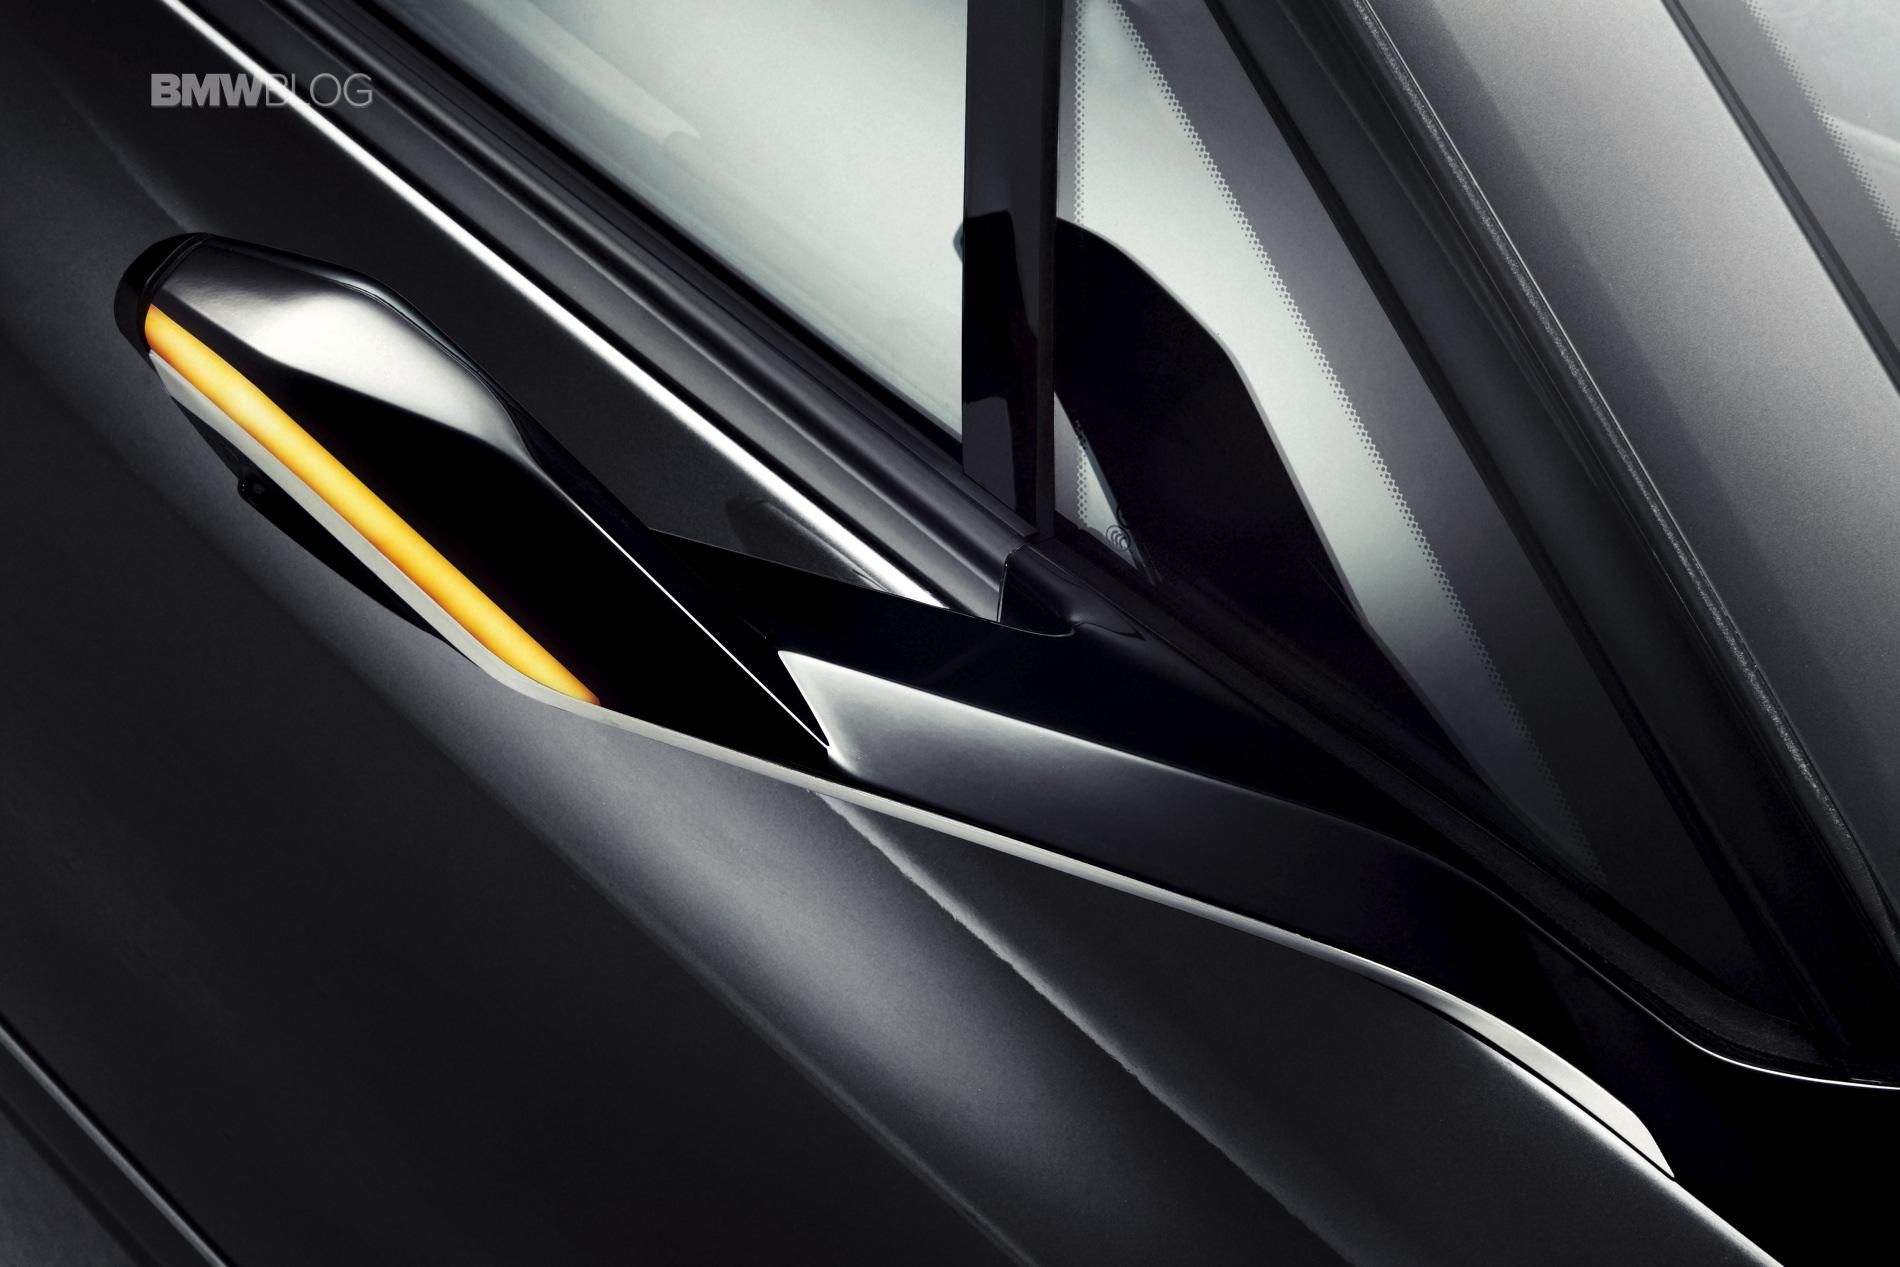 BMW i8 mirrorless images 5